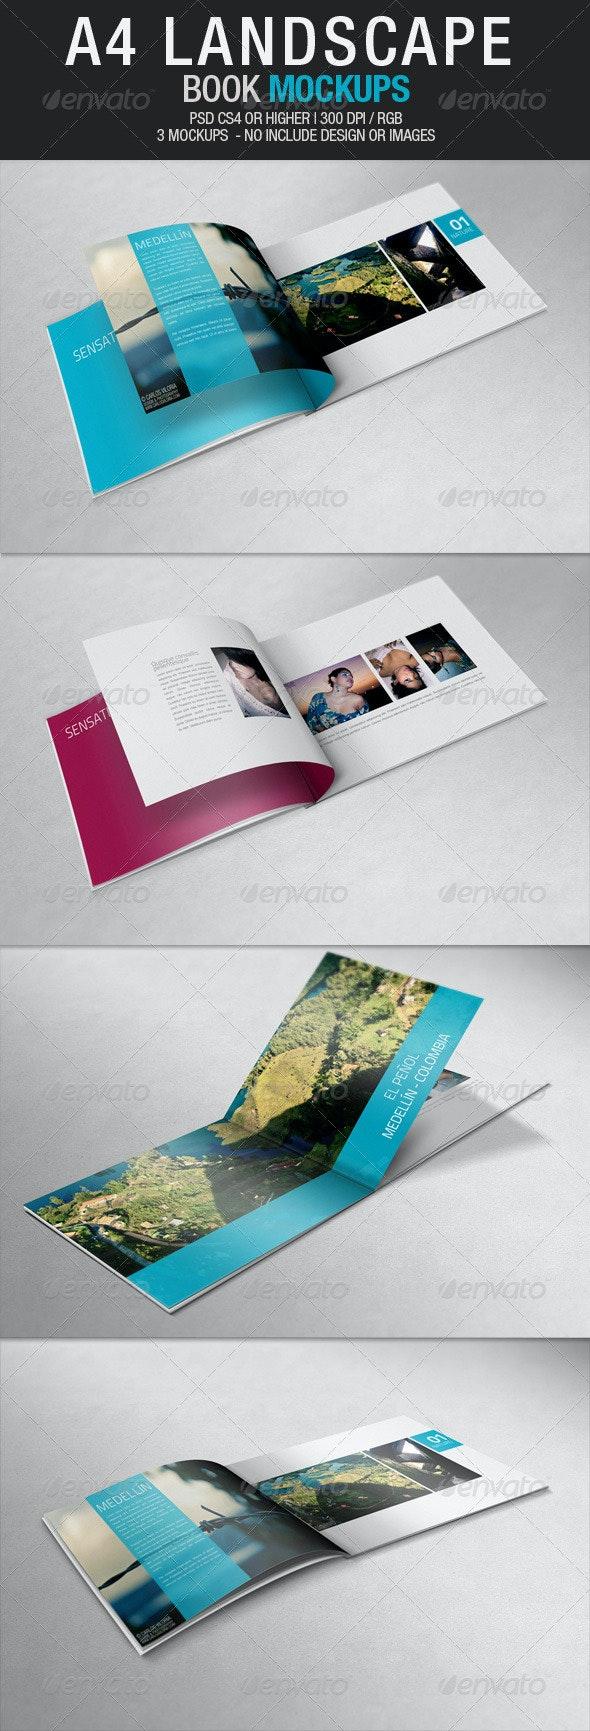 A4 Landscape Book Mockups - Books Print